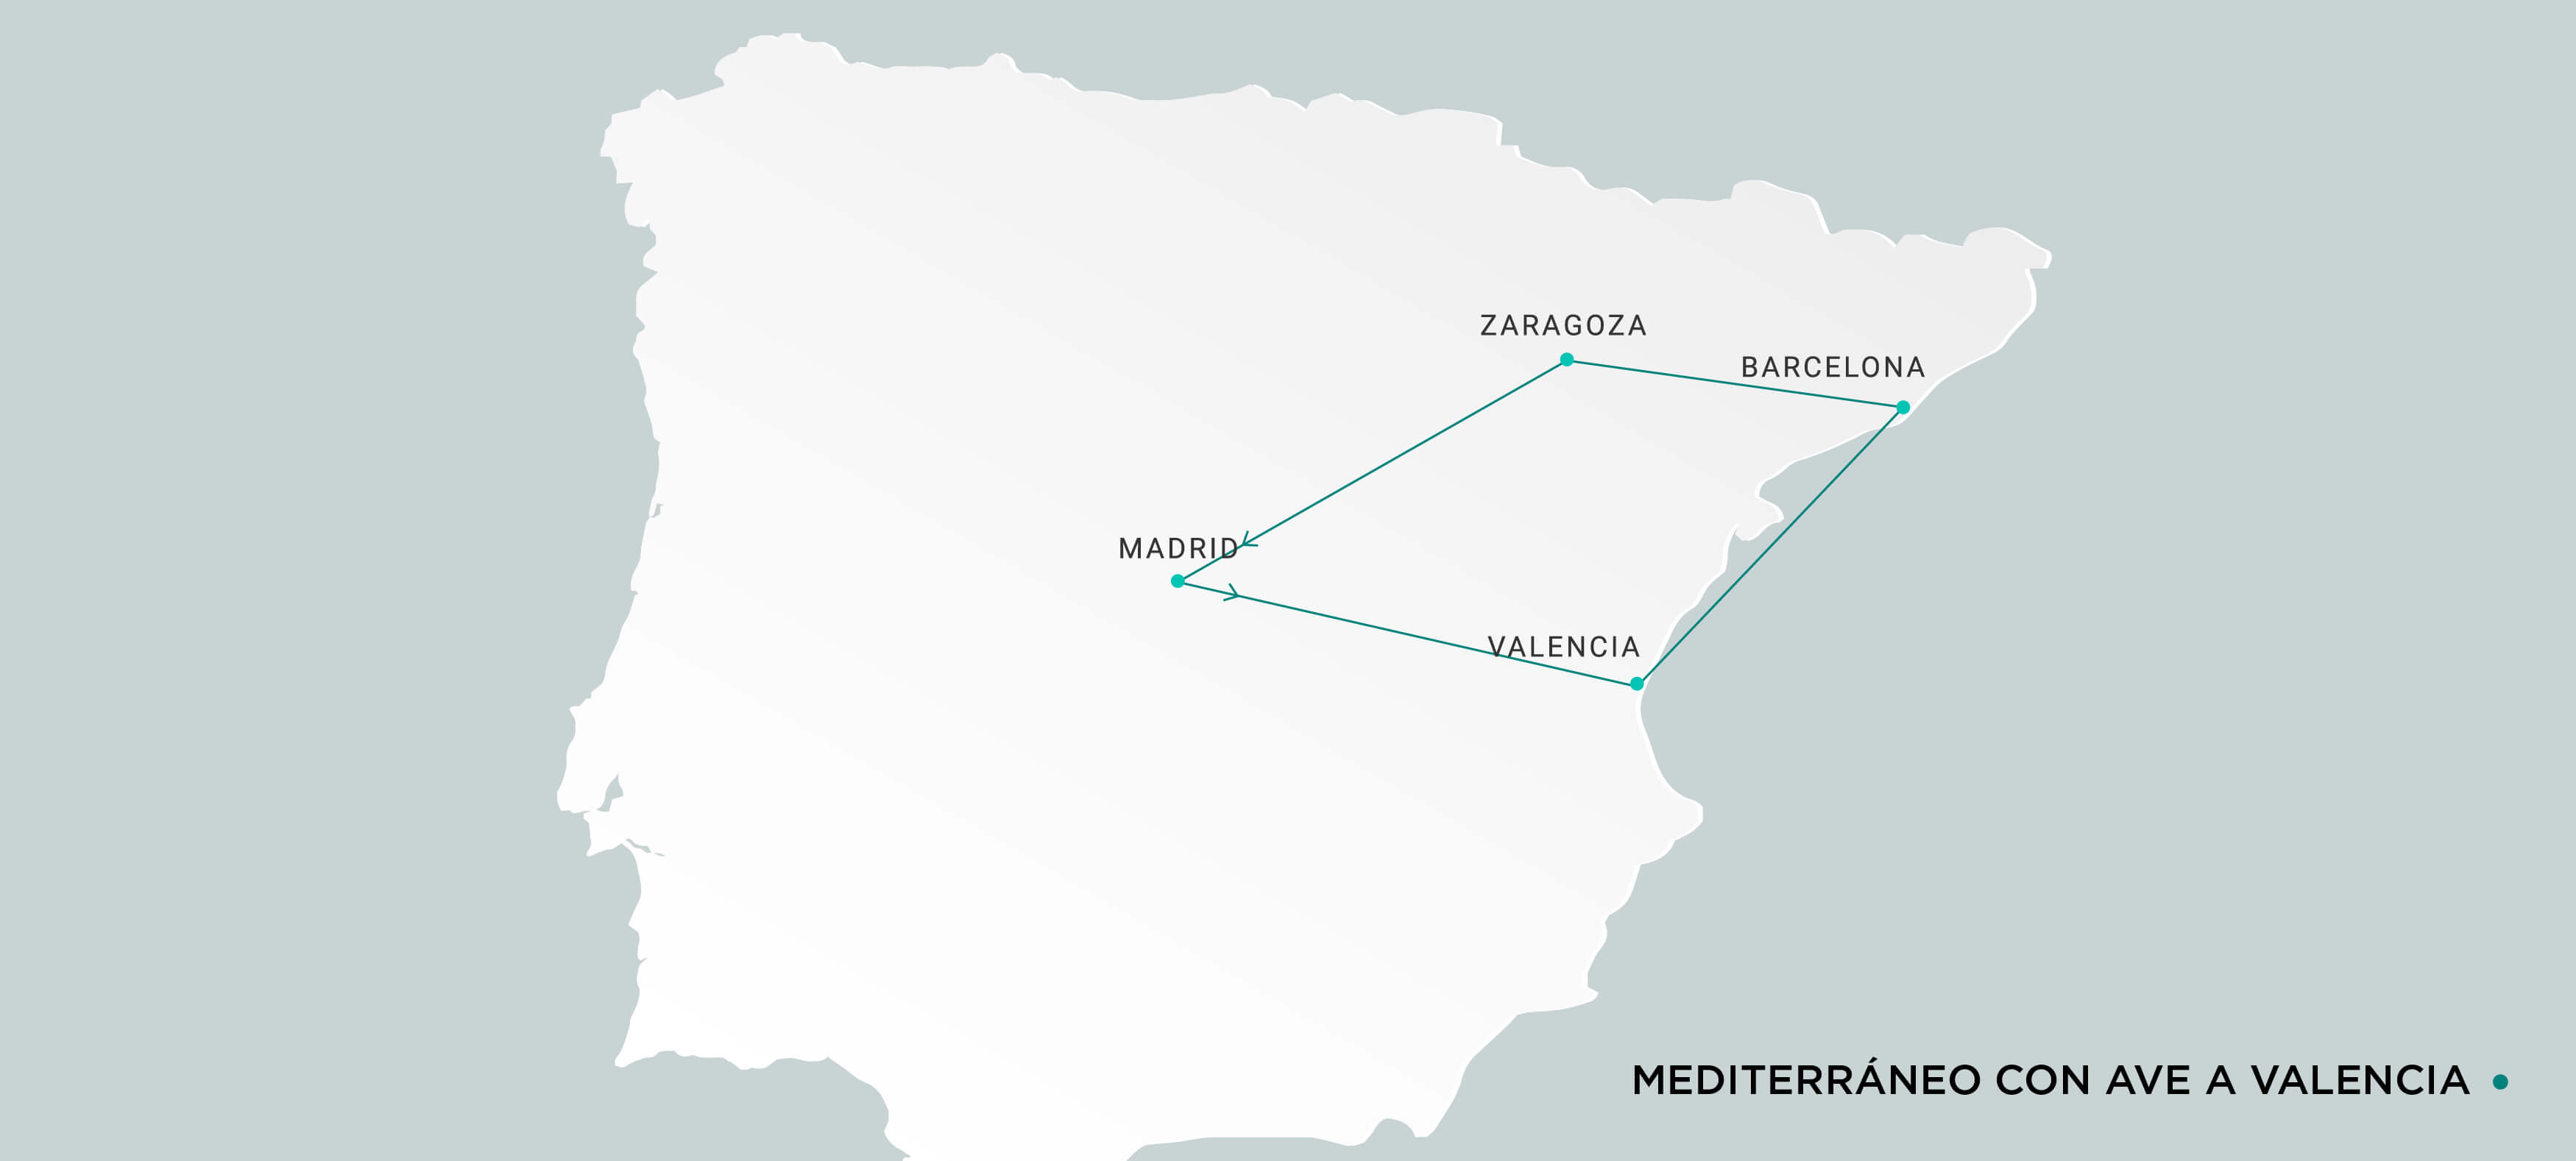 Mapa Mediterráneo con Ave a Valencia